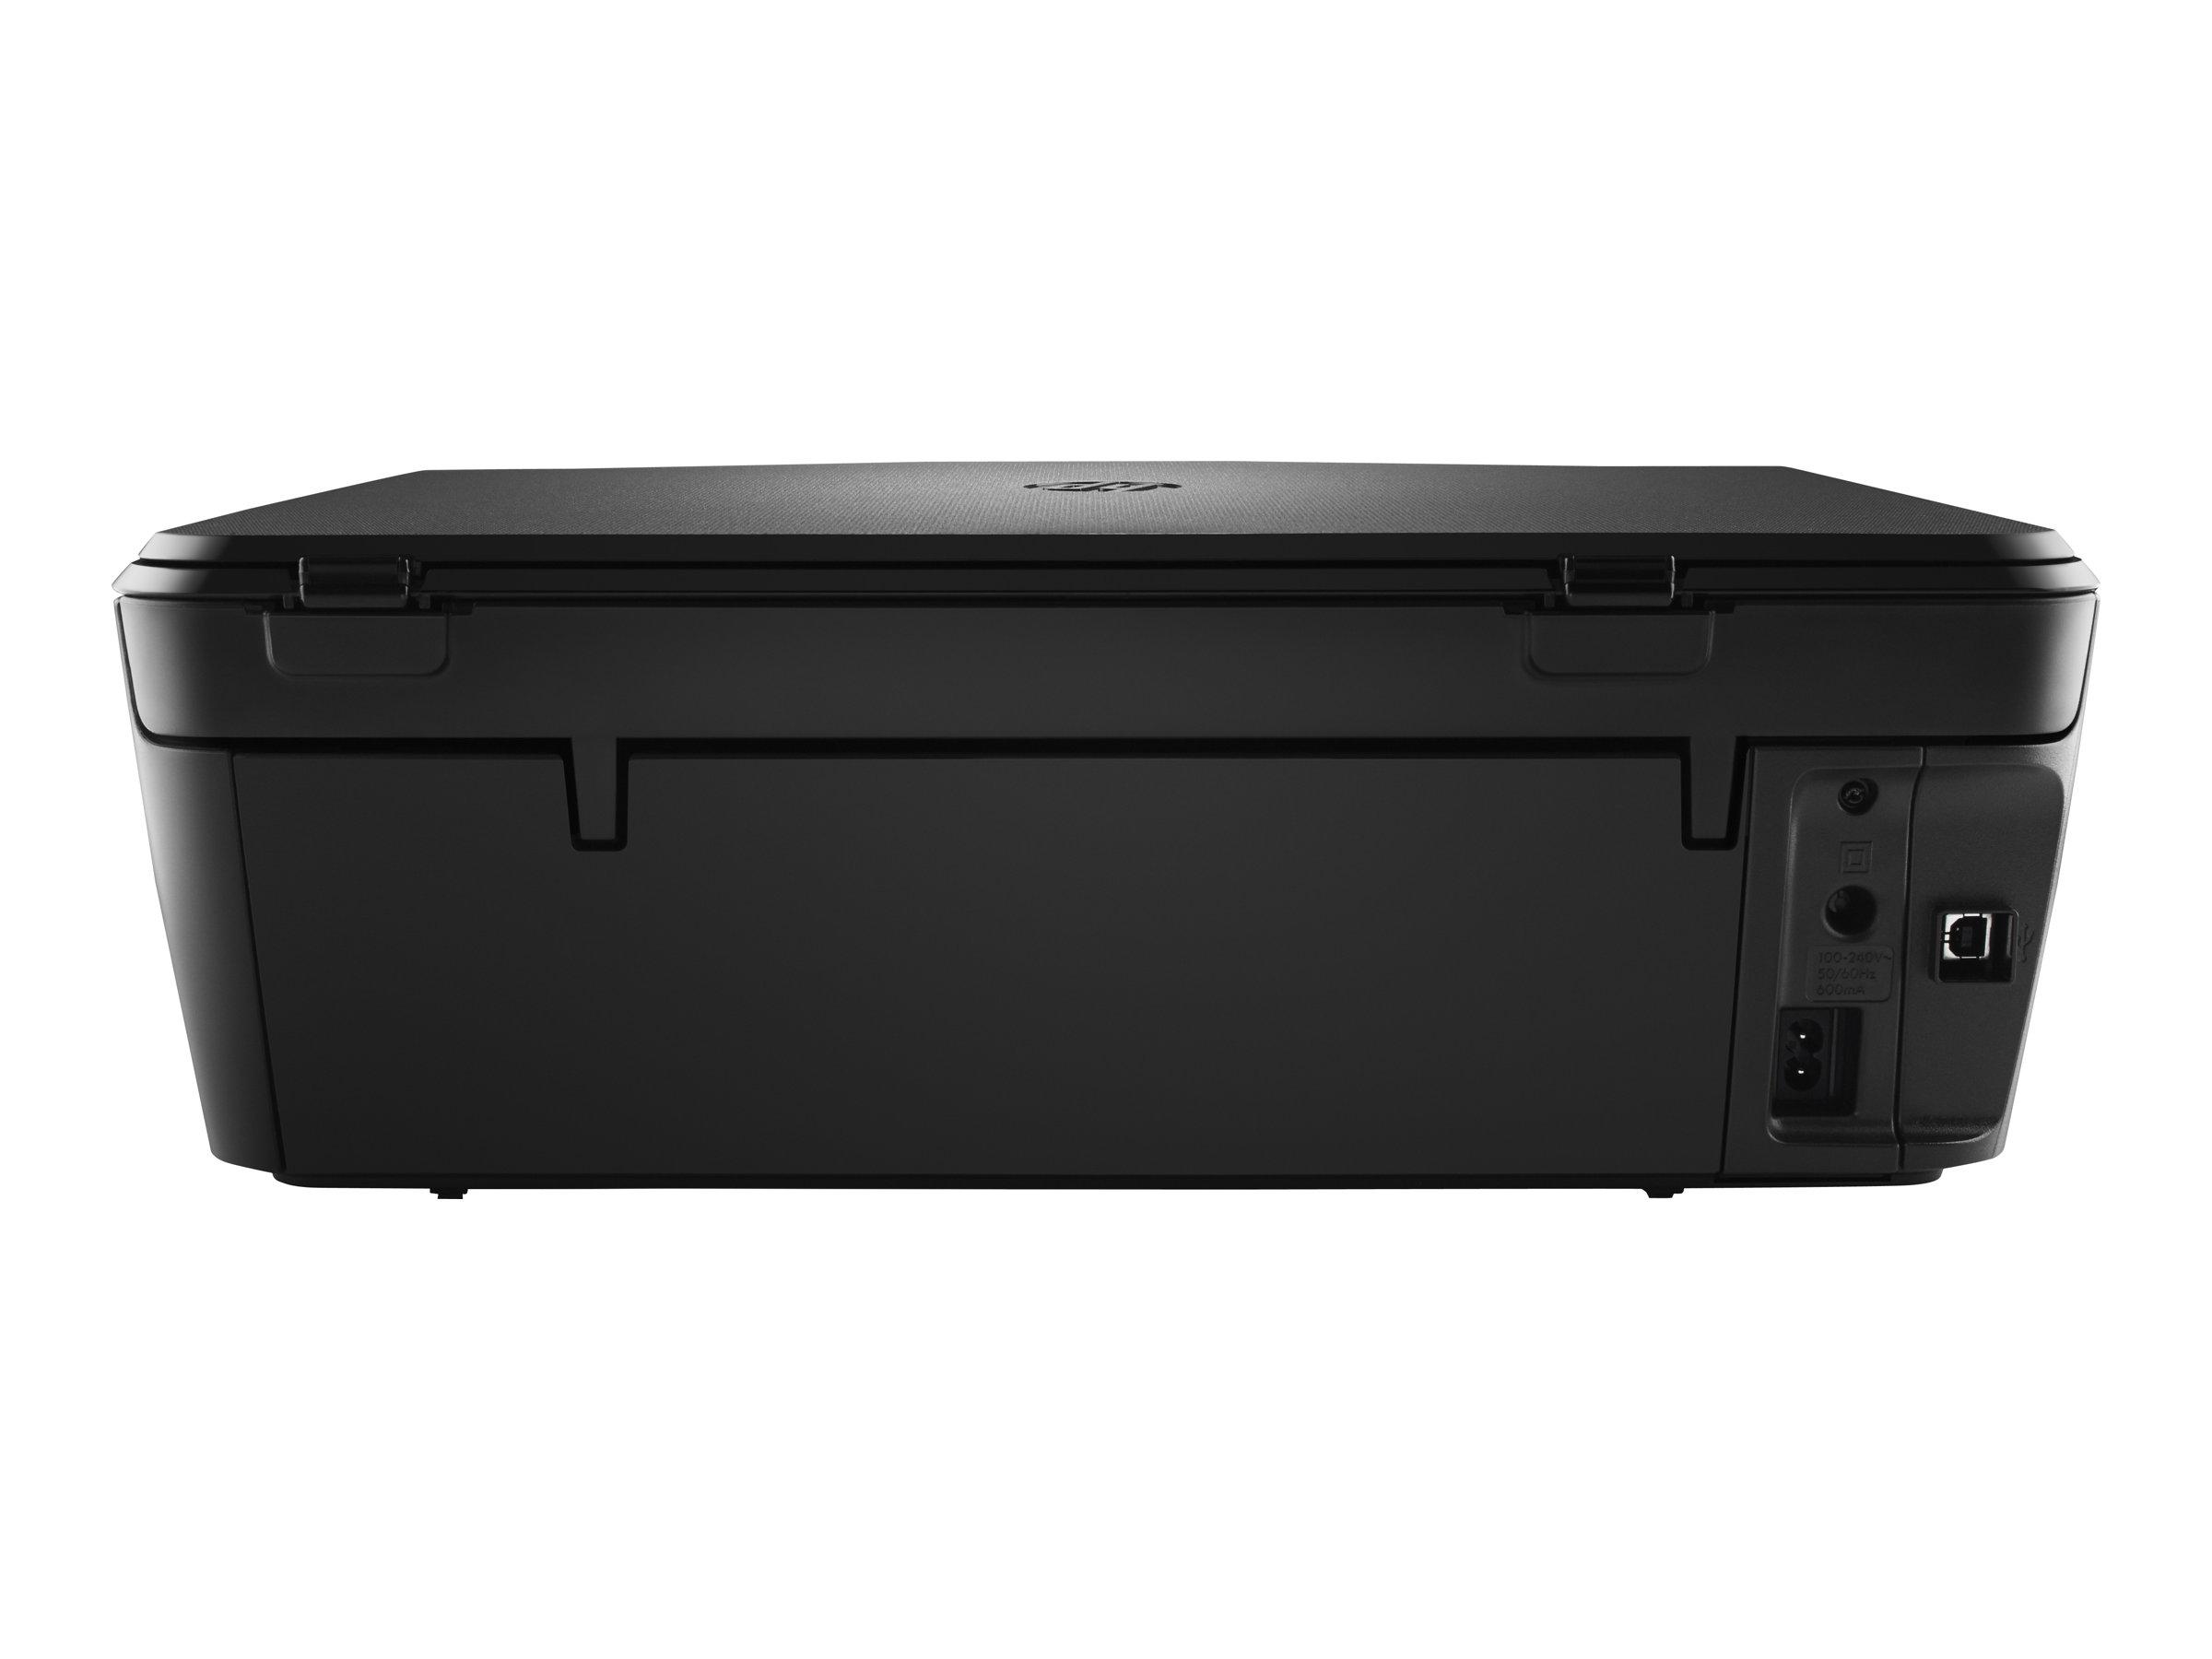 hp envy 5540 all in one imprimante multifonctions couleur imprimantes jet d 39 encre. Black Bedroom Furniture Sets. Home Design Ideas